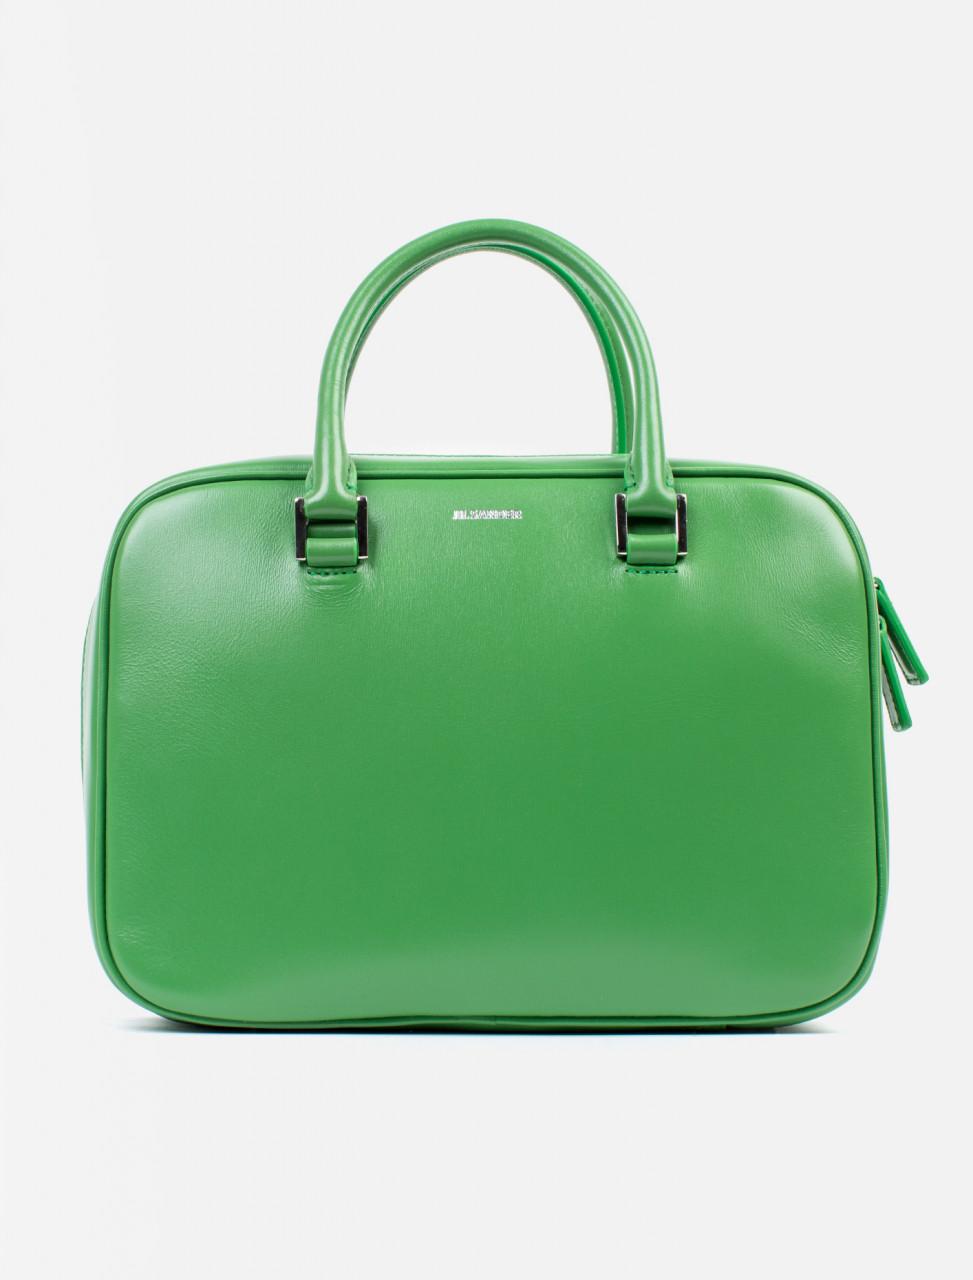 JV XS Bag in Bright Green